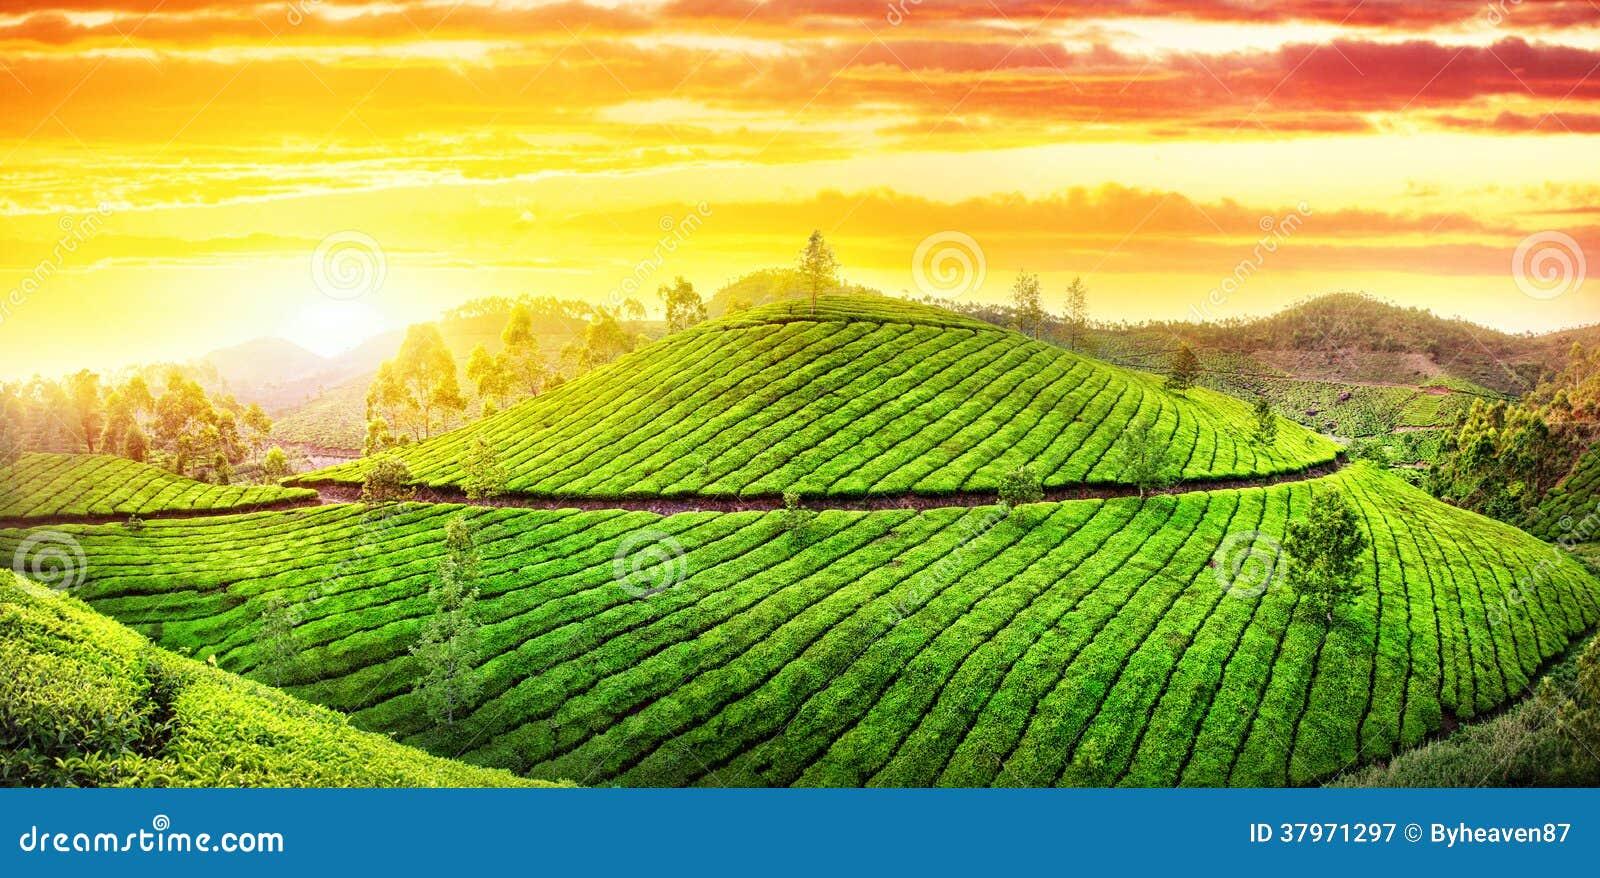 Tea Plantations Panorama Royalty Free Stock Photography ...